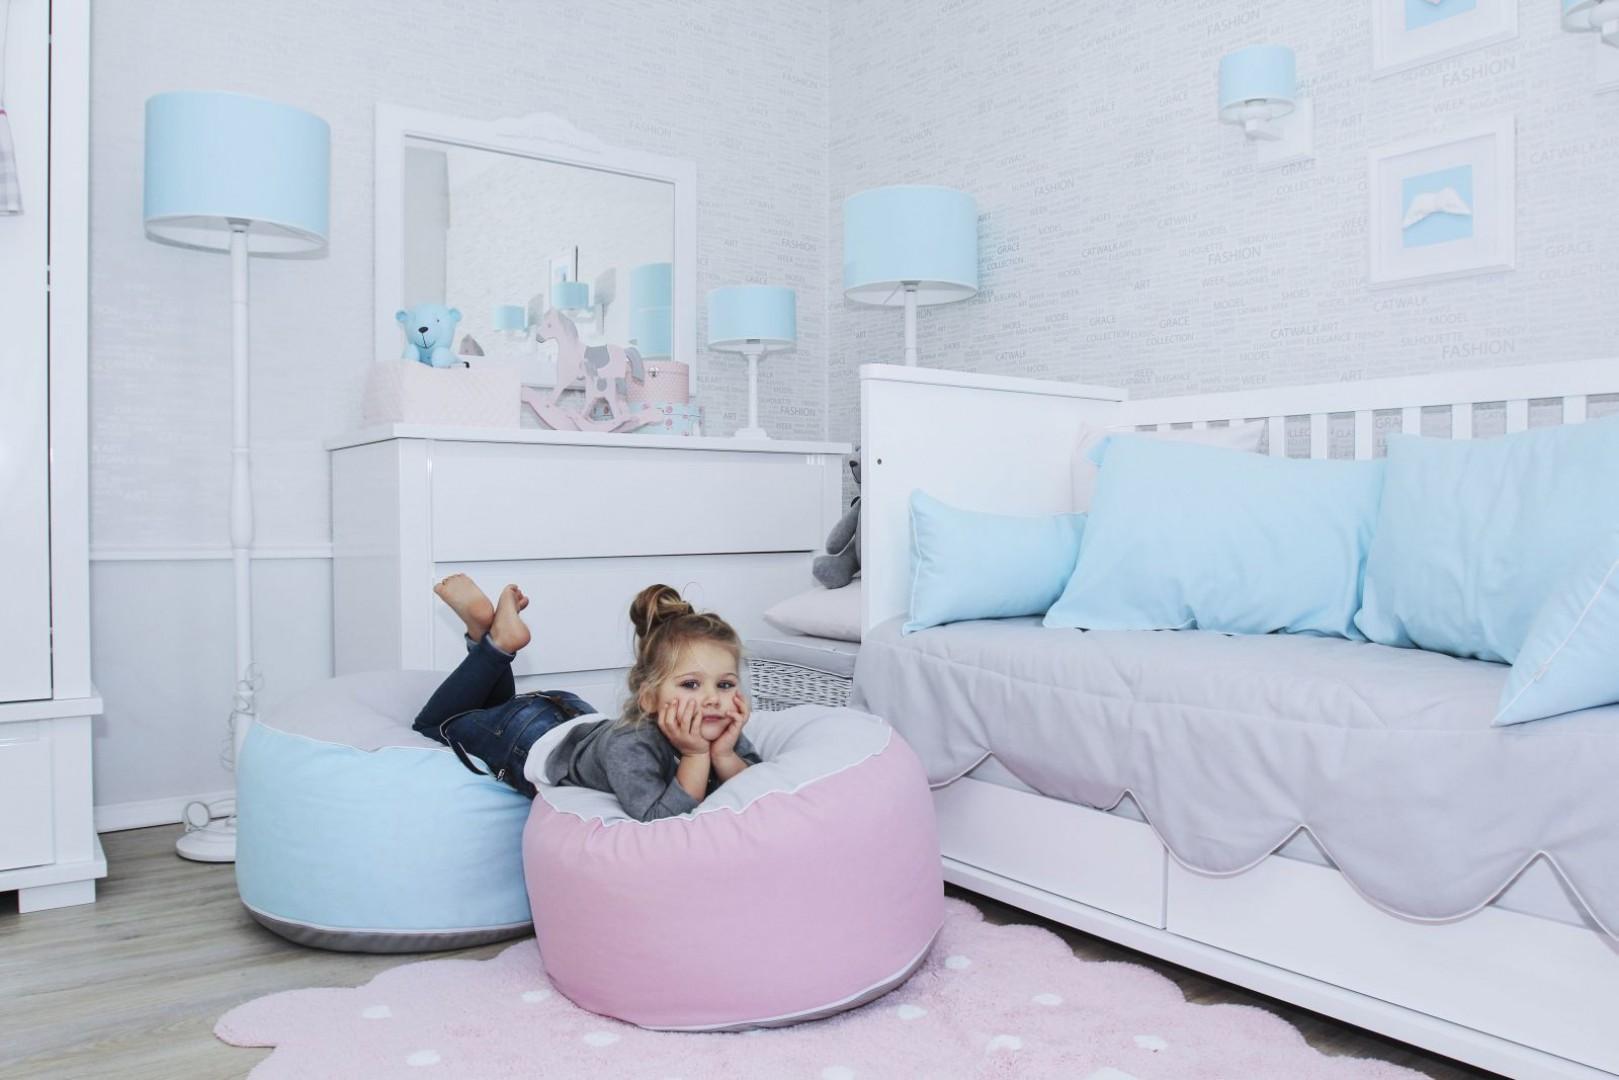 Linia nowoczesna mebli Caramella dla dzieci. Fot. Studio Caramella